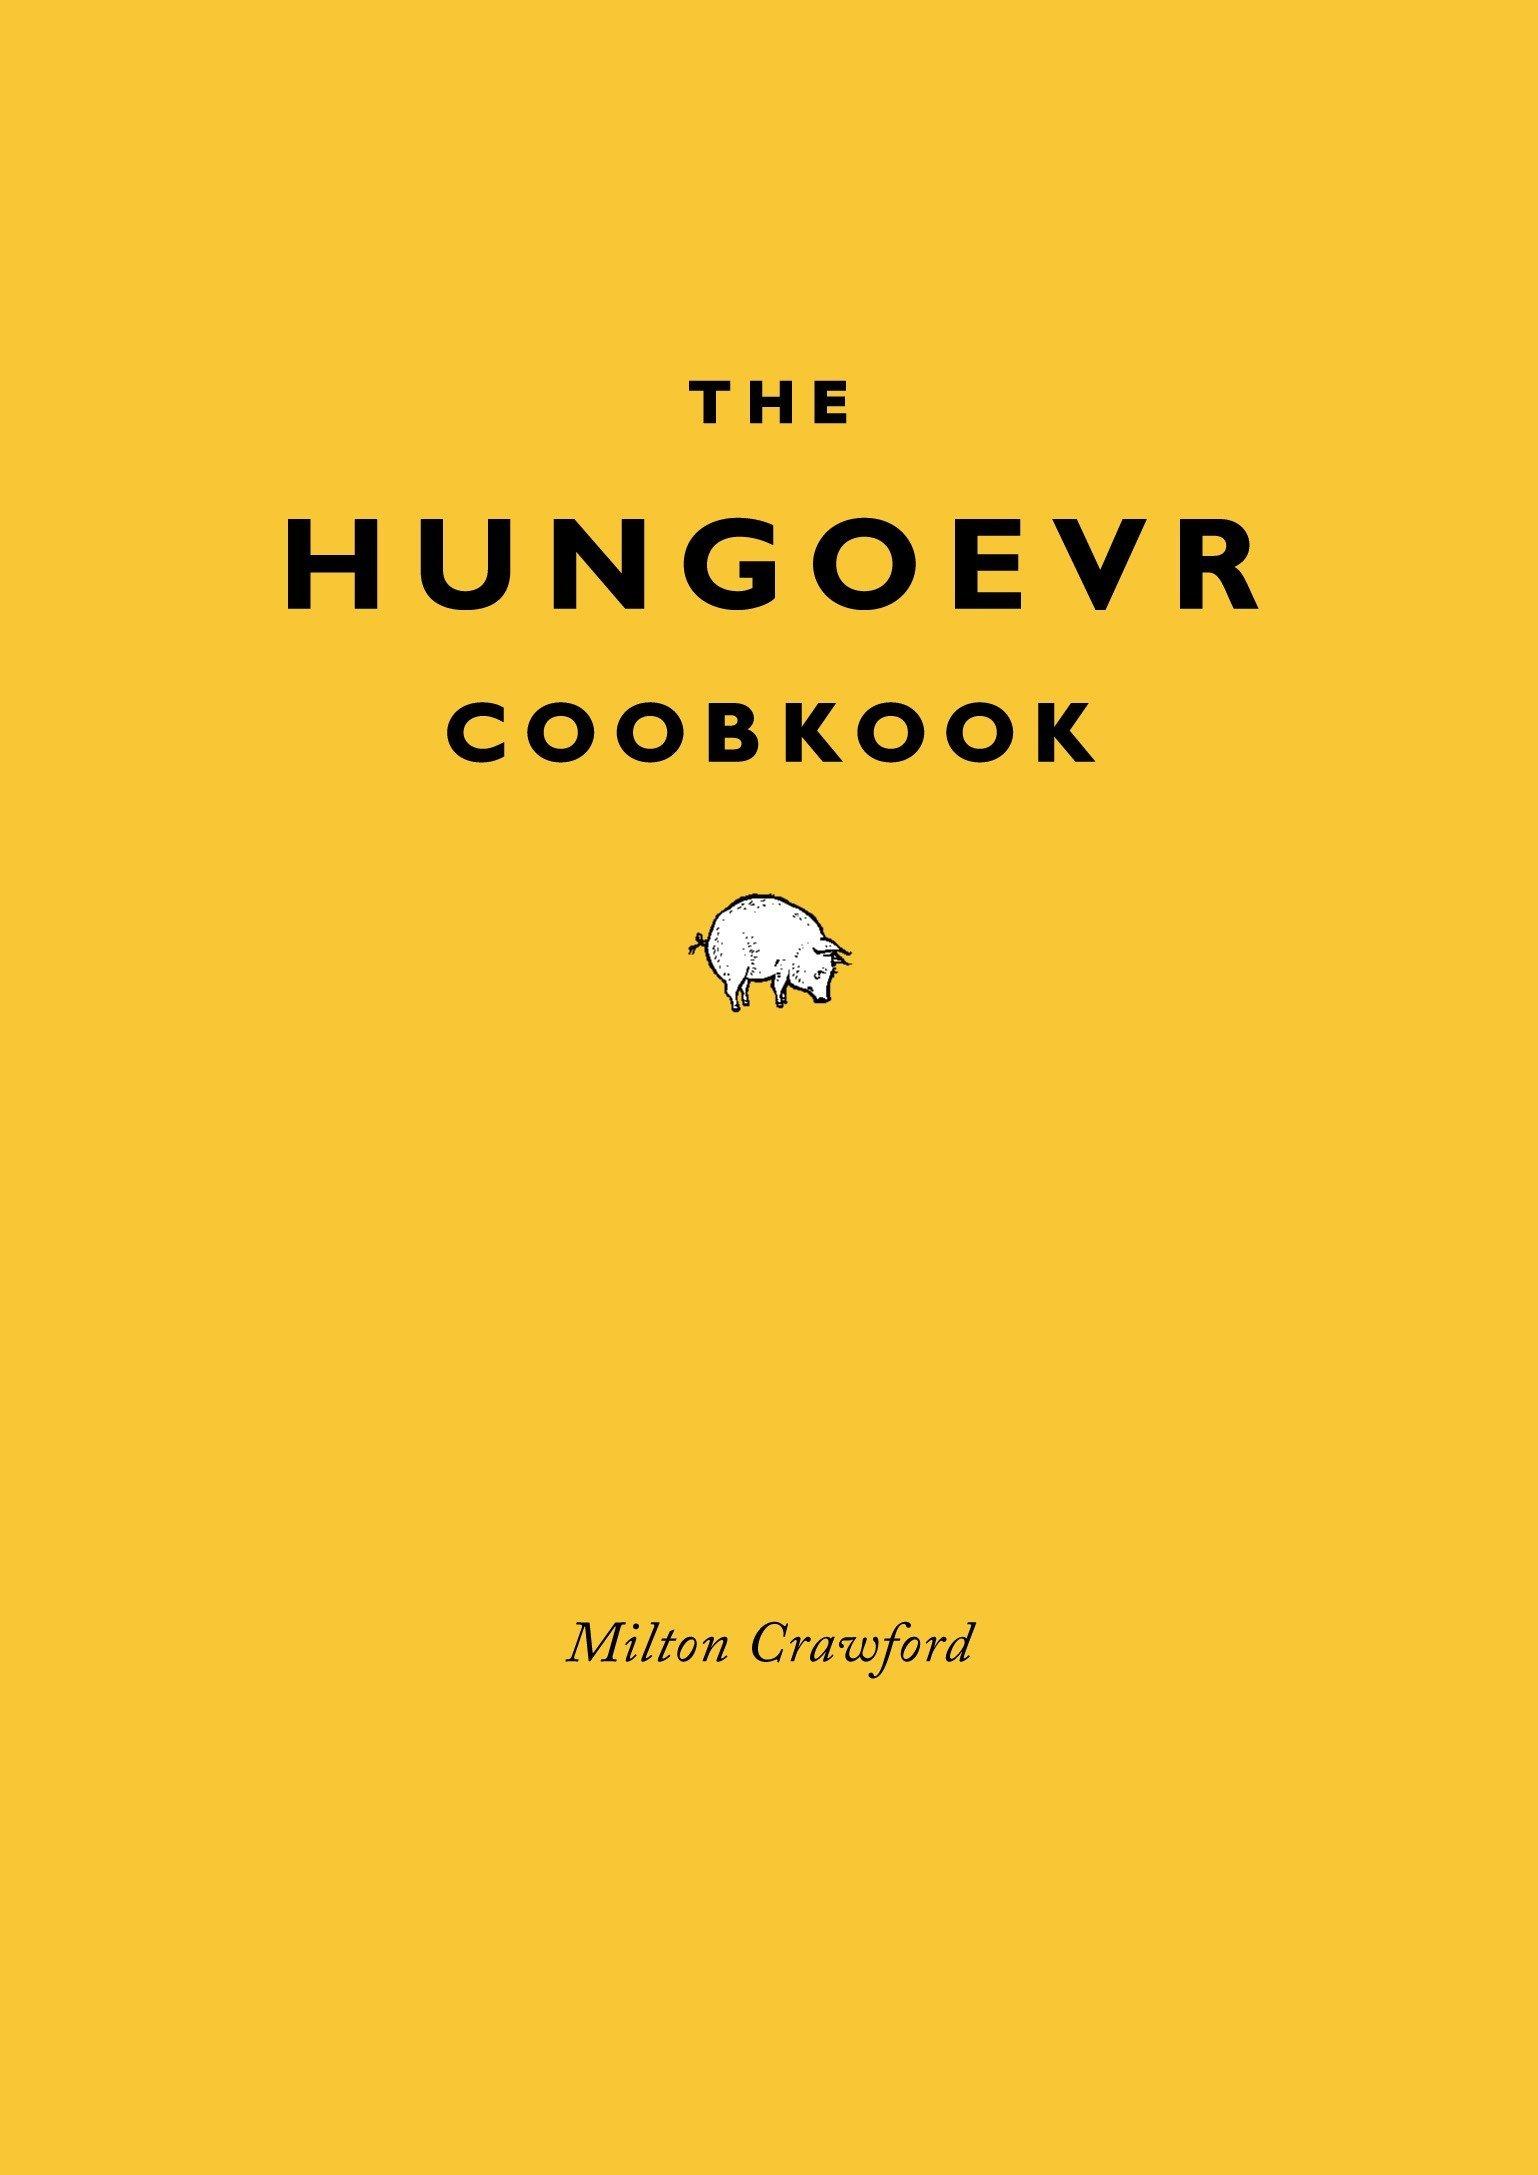 Hungover Cookbook Milton Crawford